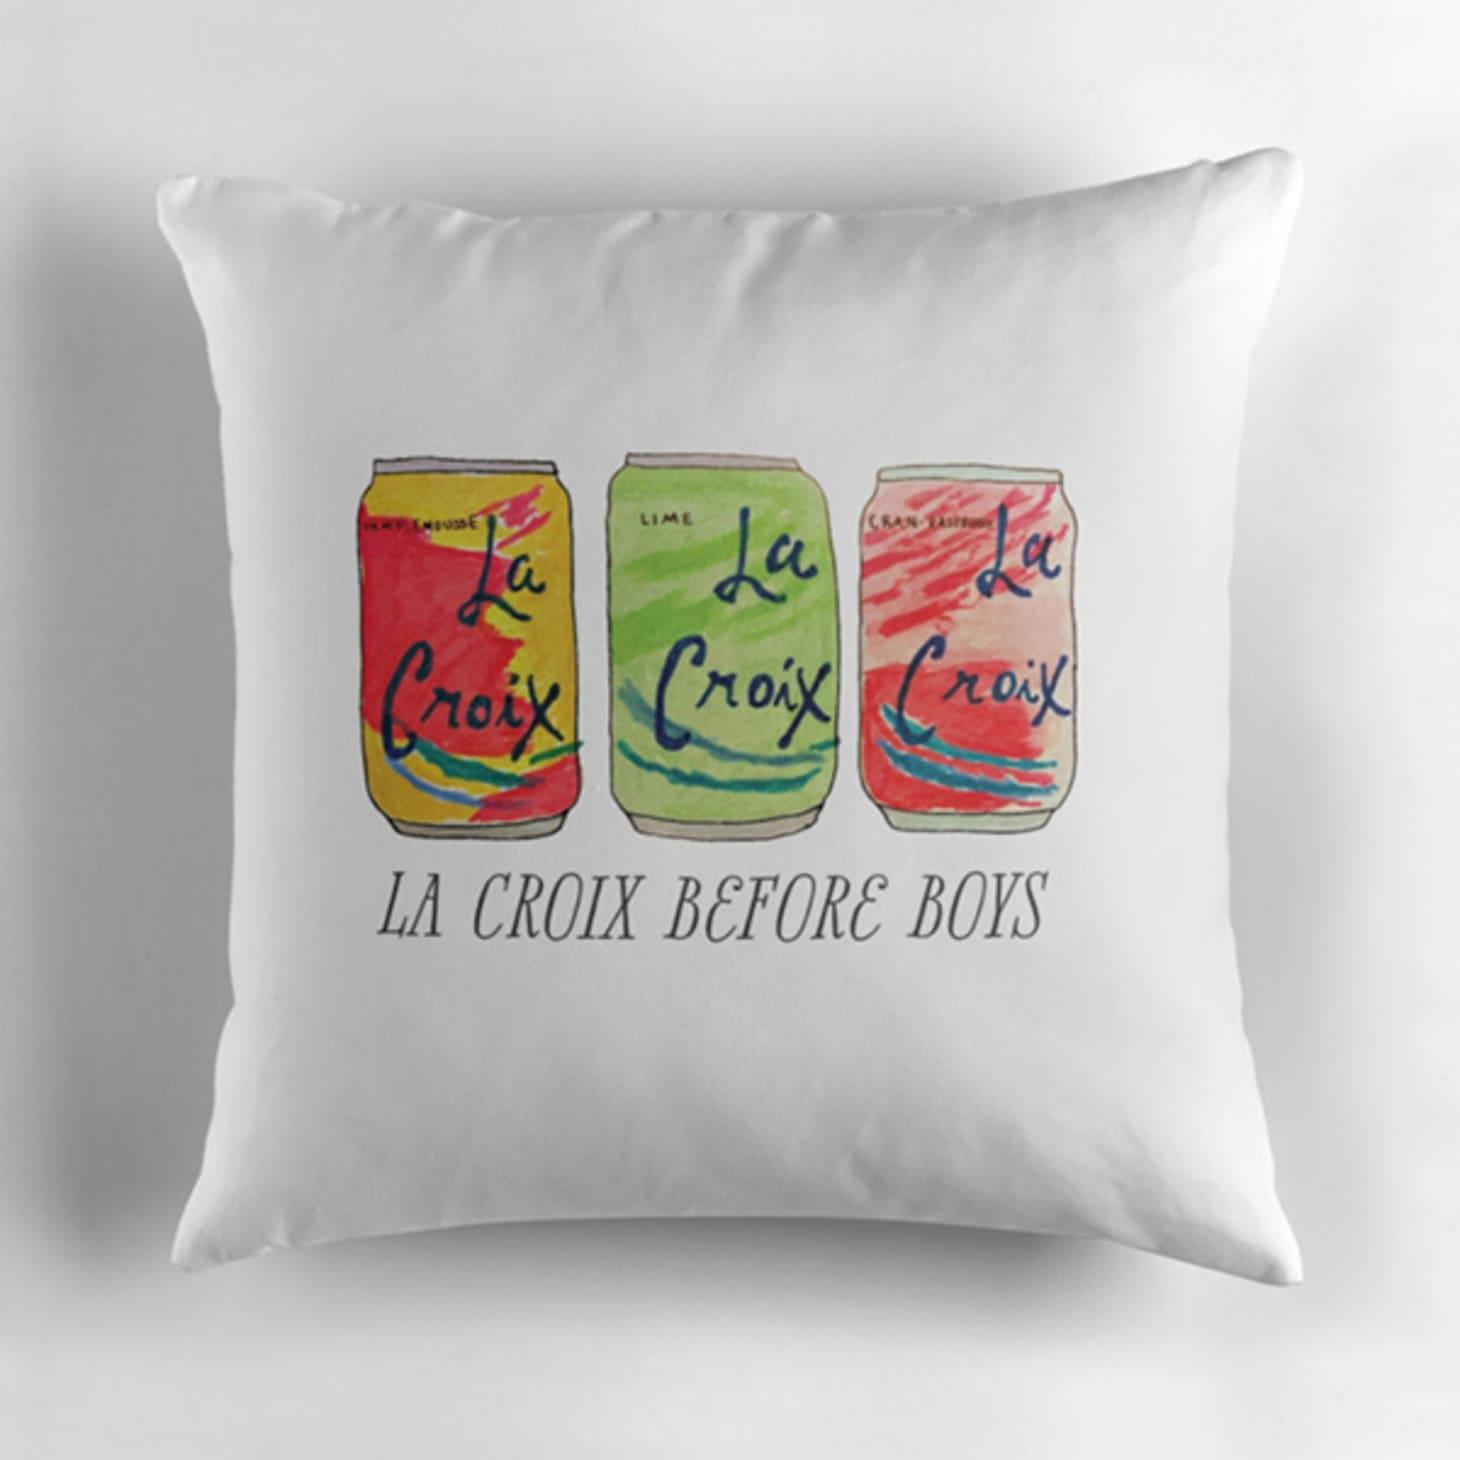 La Croix-Themed Home Decor & Gift Ideas | Apartment Therapy